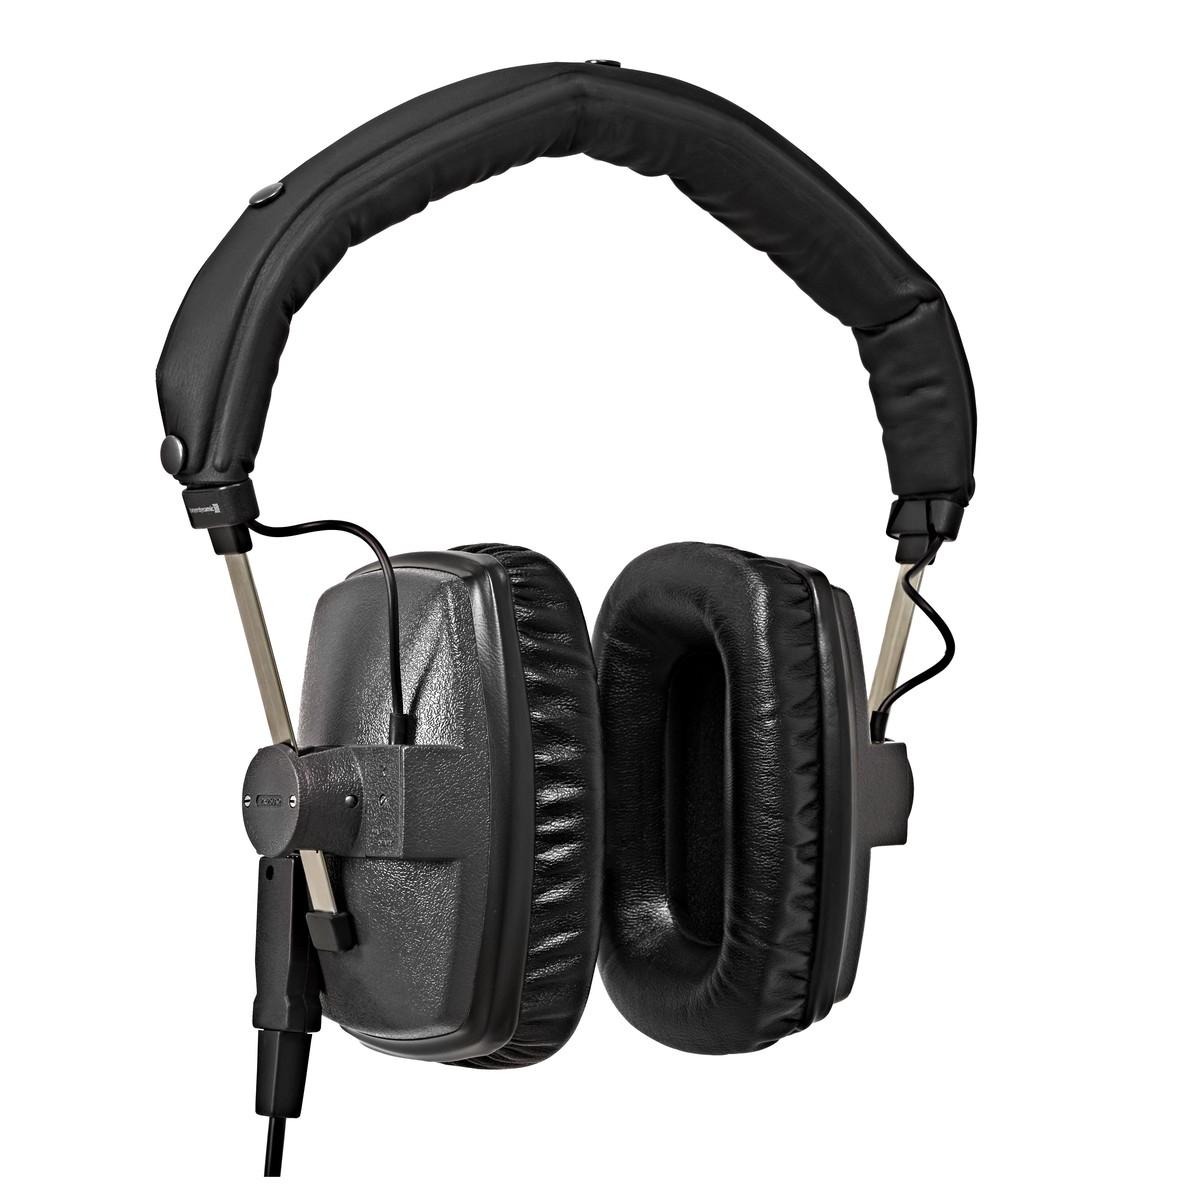 beyerdynamic dt 150 closed back headphones 250 ohm at gear4music. Black Bedroom Furniture Sets. Home Design Ideas